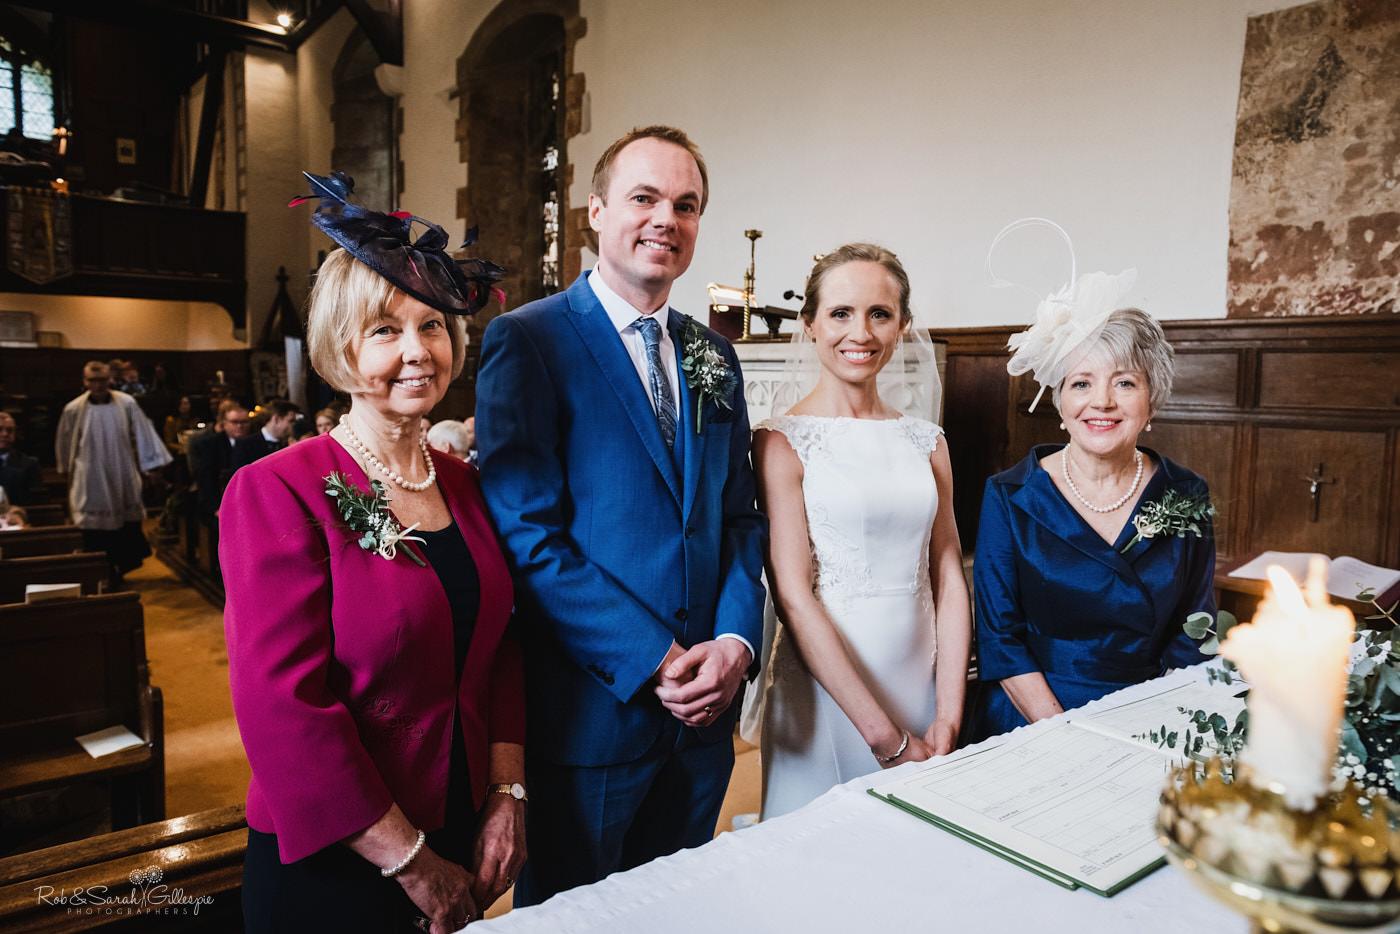 Wedding at St Kenelm's church